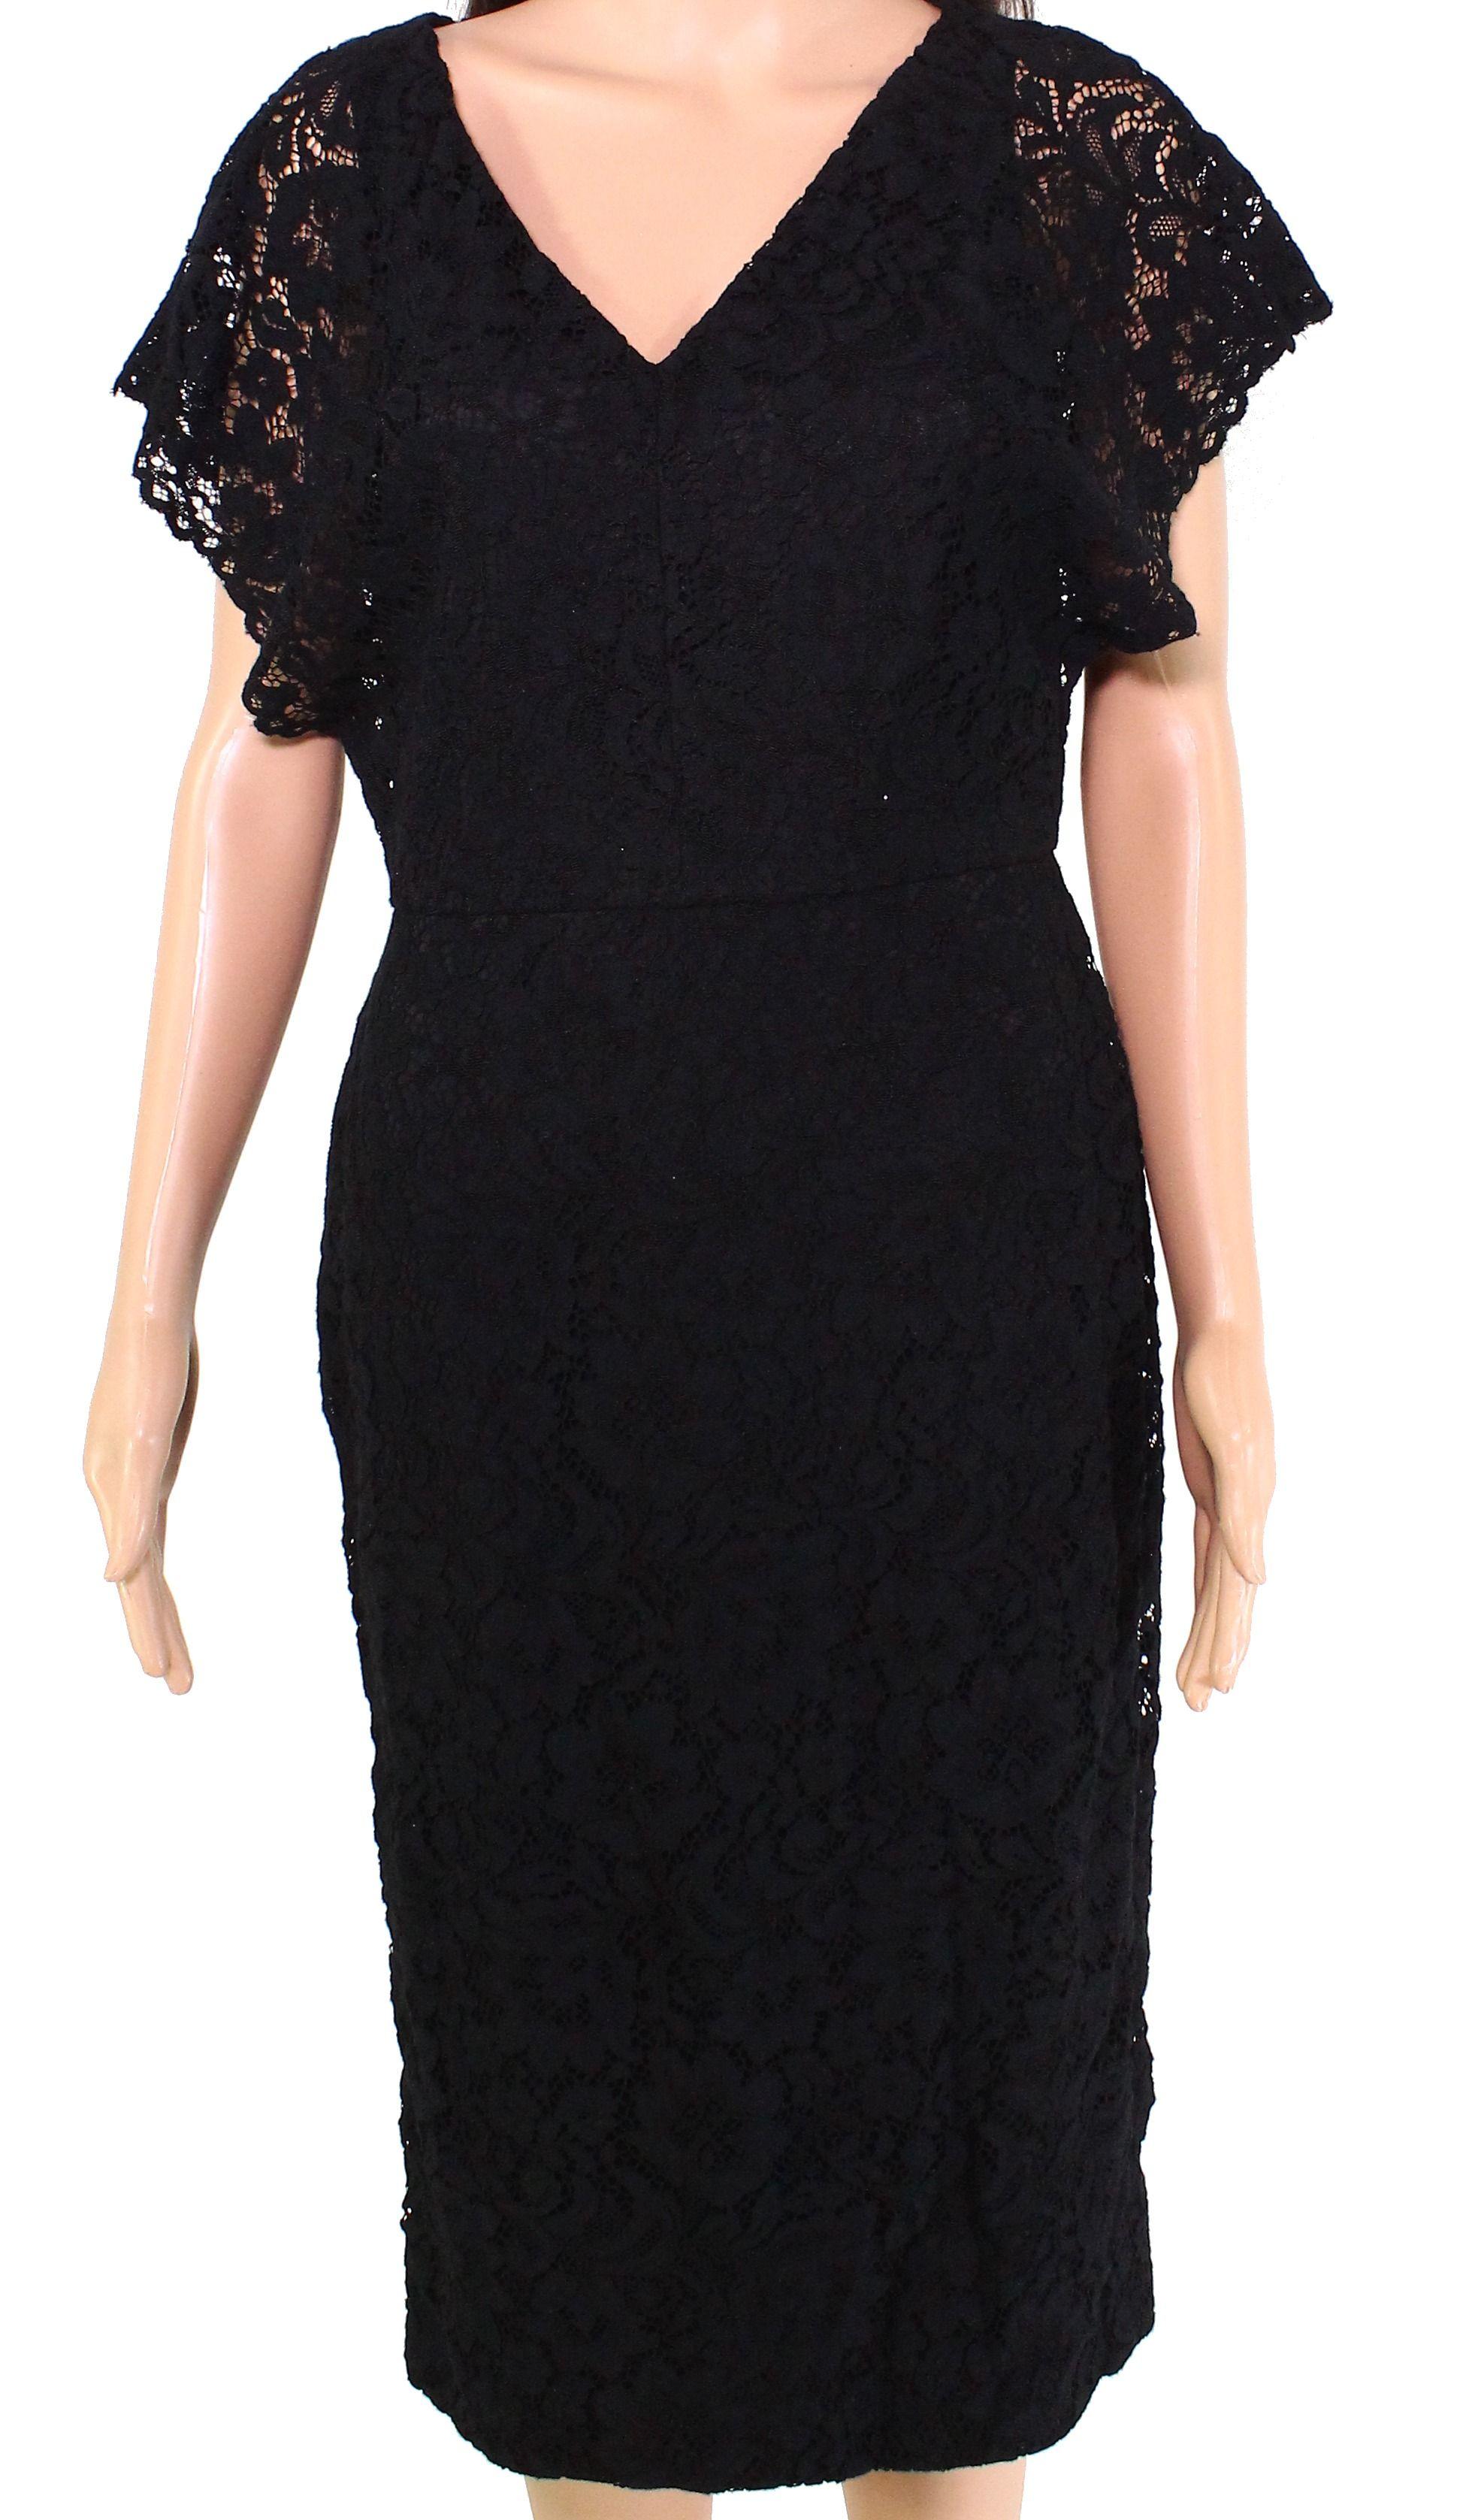 Lauren by Ralph Lauren Women's Dress Black Size 8 Sheath Lace V-Neck